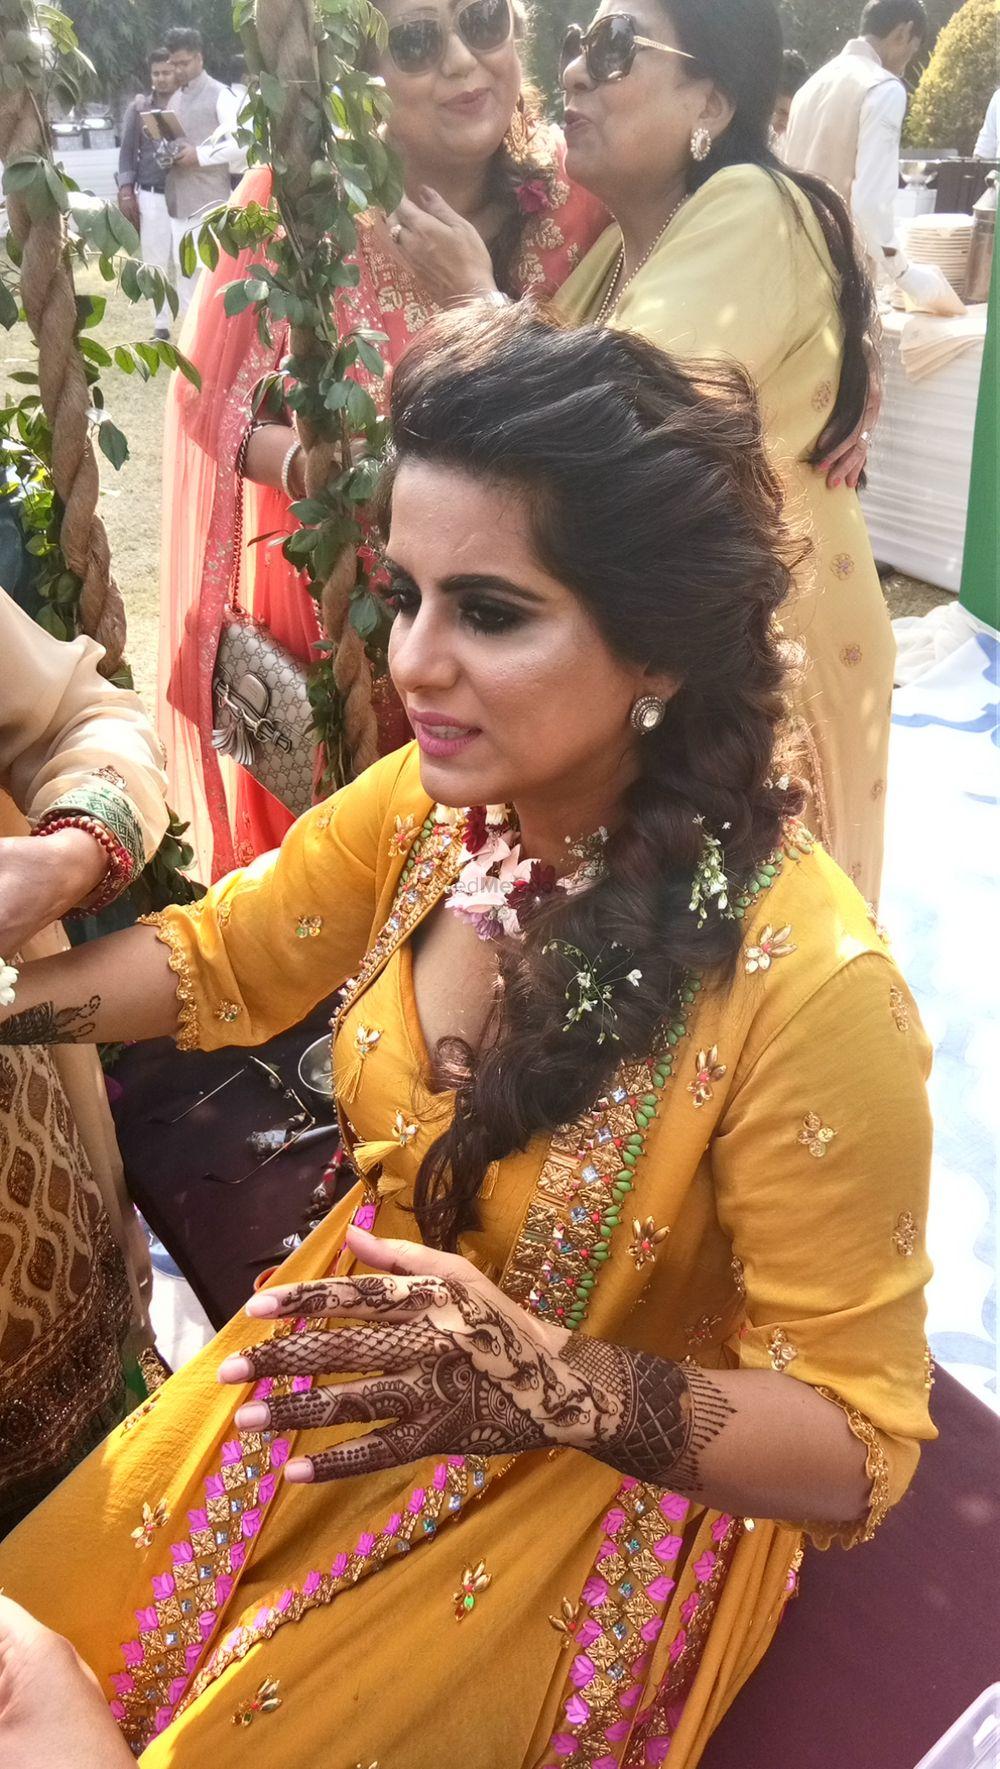 Photo From Ginni Kohli, The founder and CEO OF Wedwise,  Bridal Mehendi ceremony at sainik farms at Saket,  delhi on 17th Feb 2018 - By Shalini Mehendi Artist